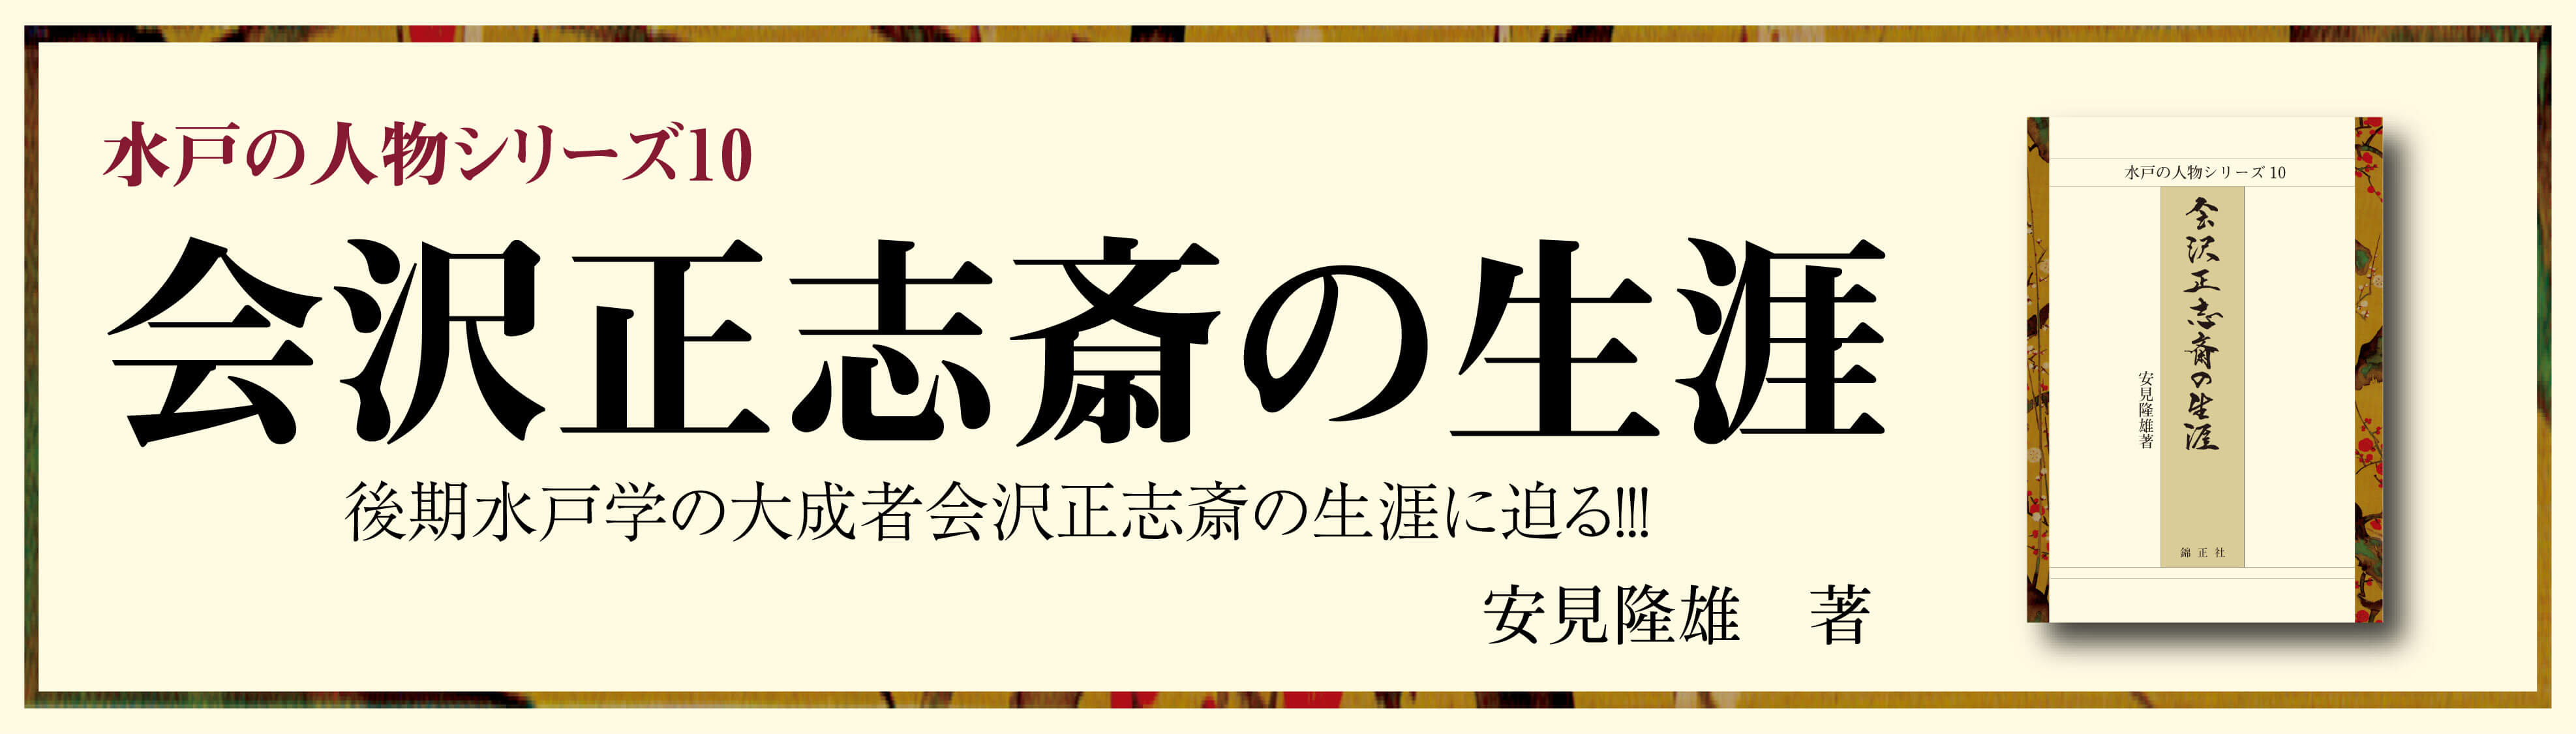 会沢正志斎の生涯